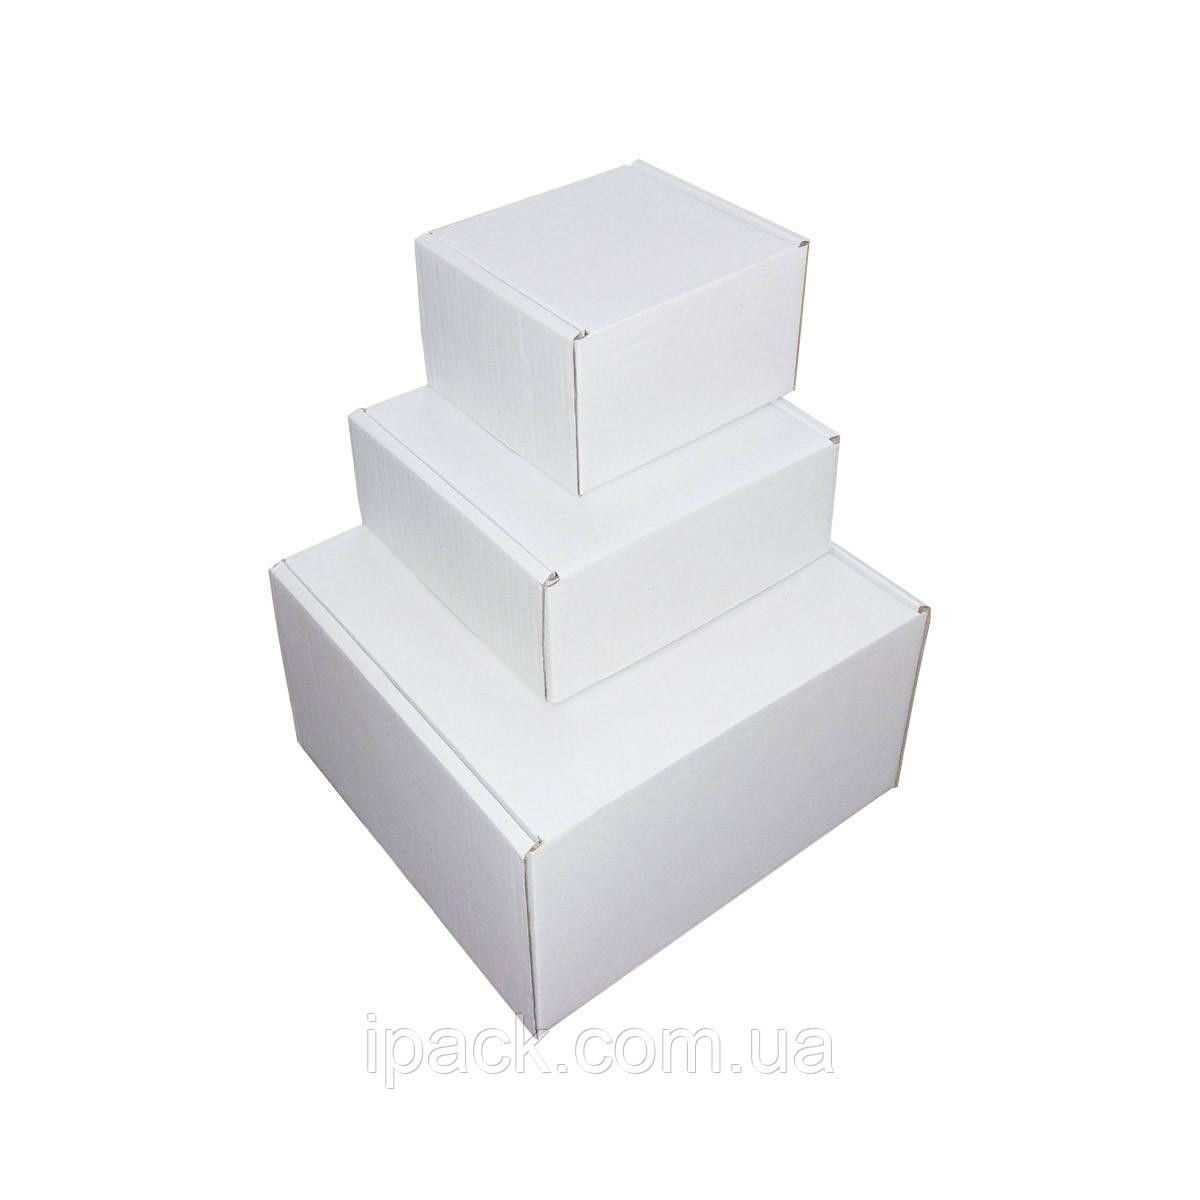 Коробка картонная самосборная, 130*130*50, мм, белая, микрогофрокартон